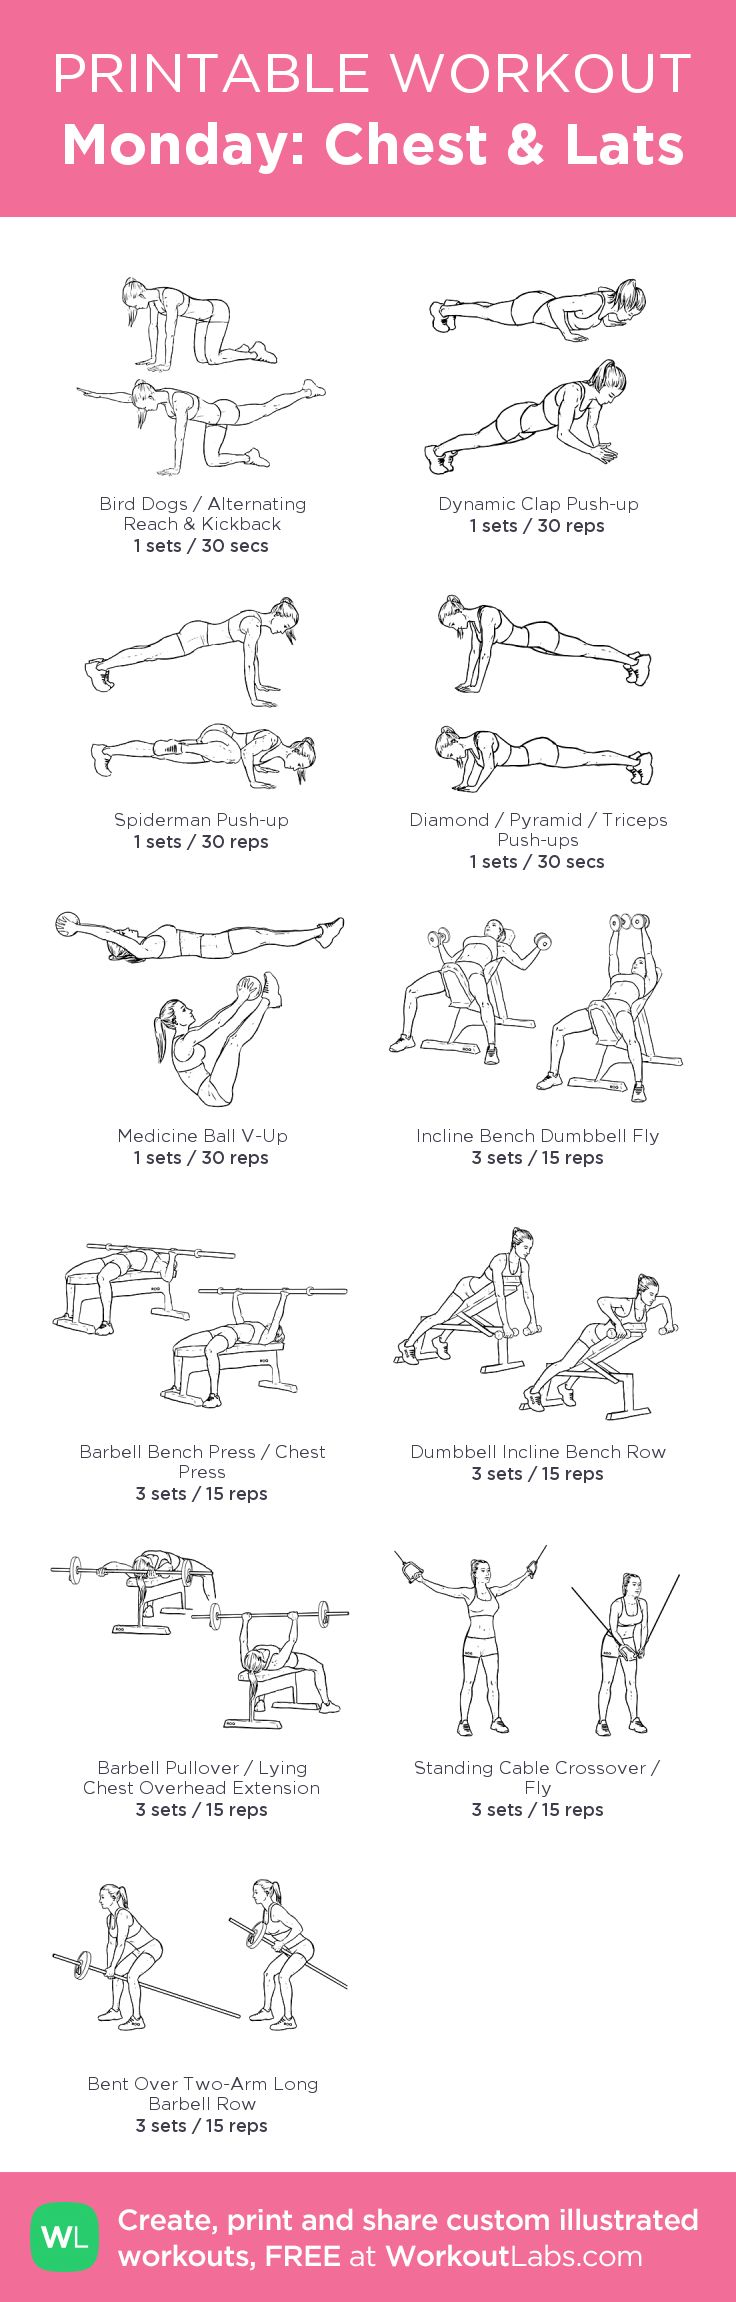 300 workout pdf download free